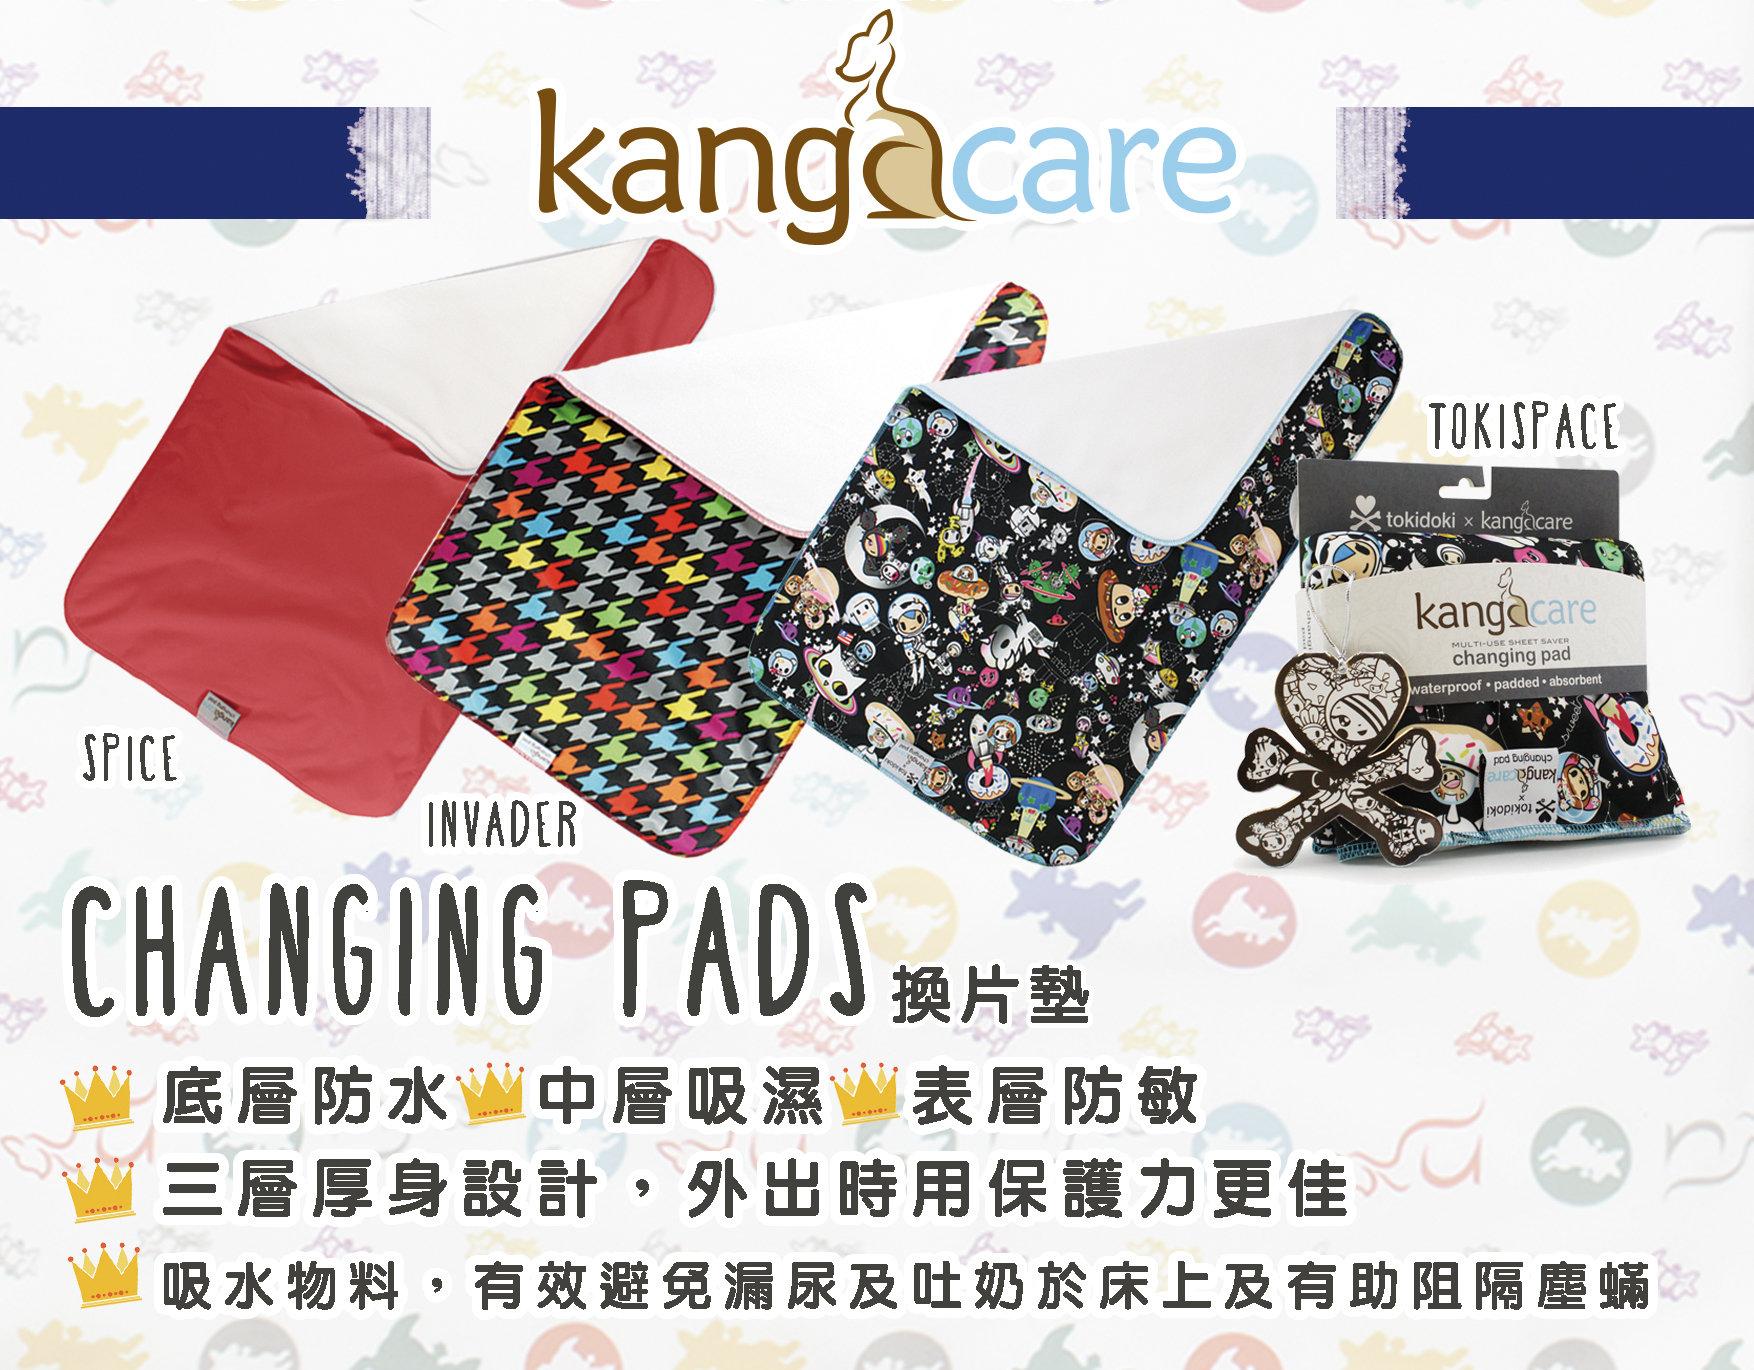 Kanga Care Changing Pad Spice